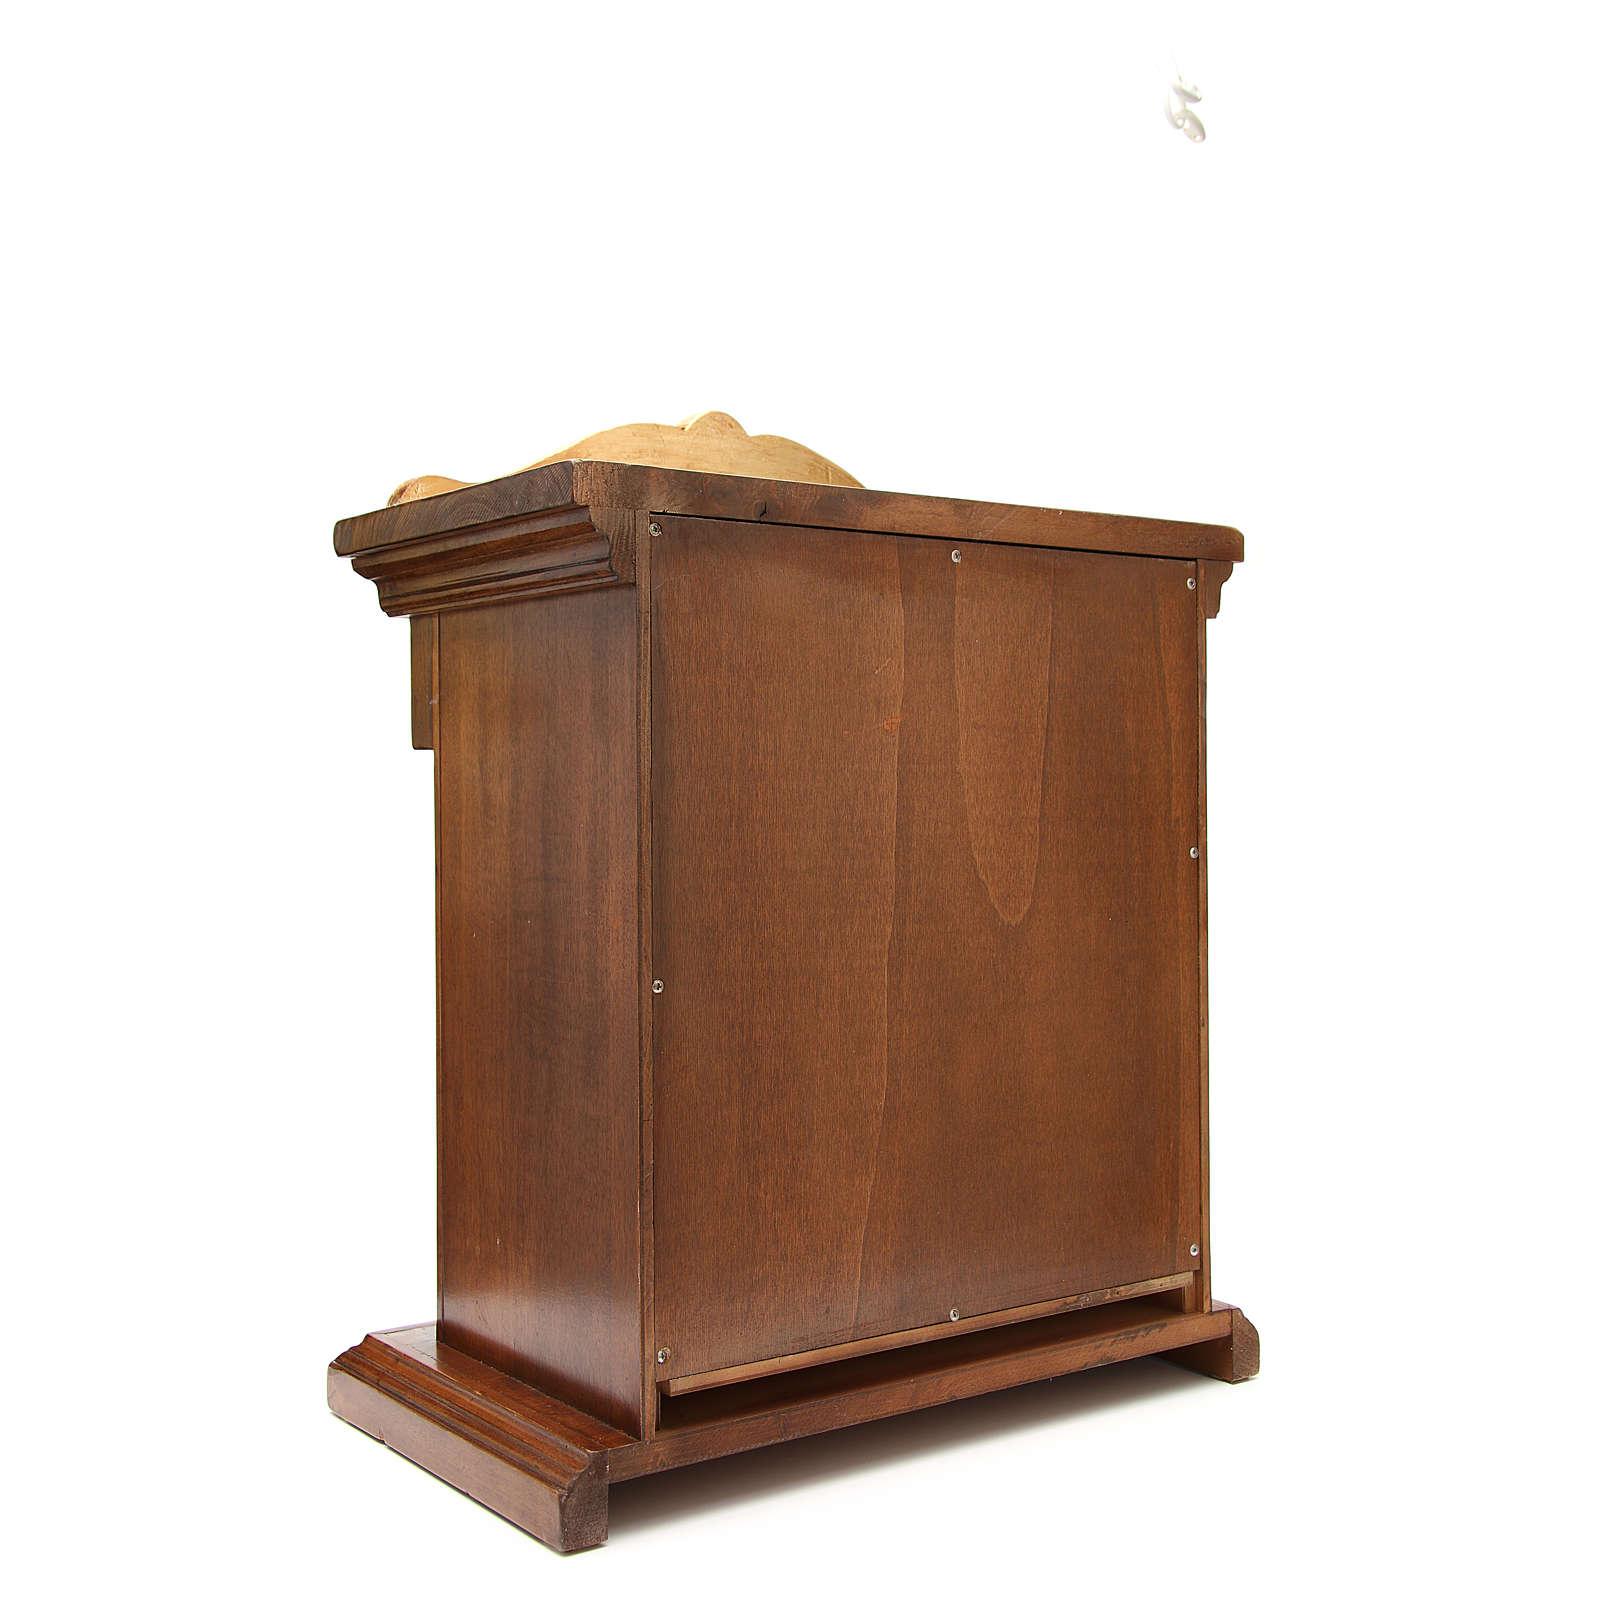 Tabernacle en bois avec chapiteau feuille or 70x45x30 4